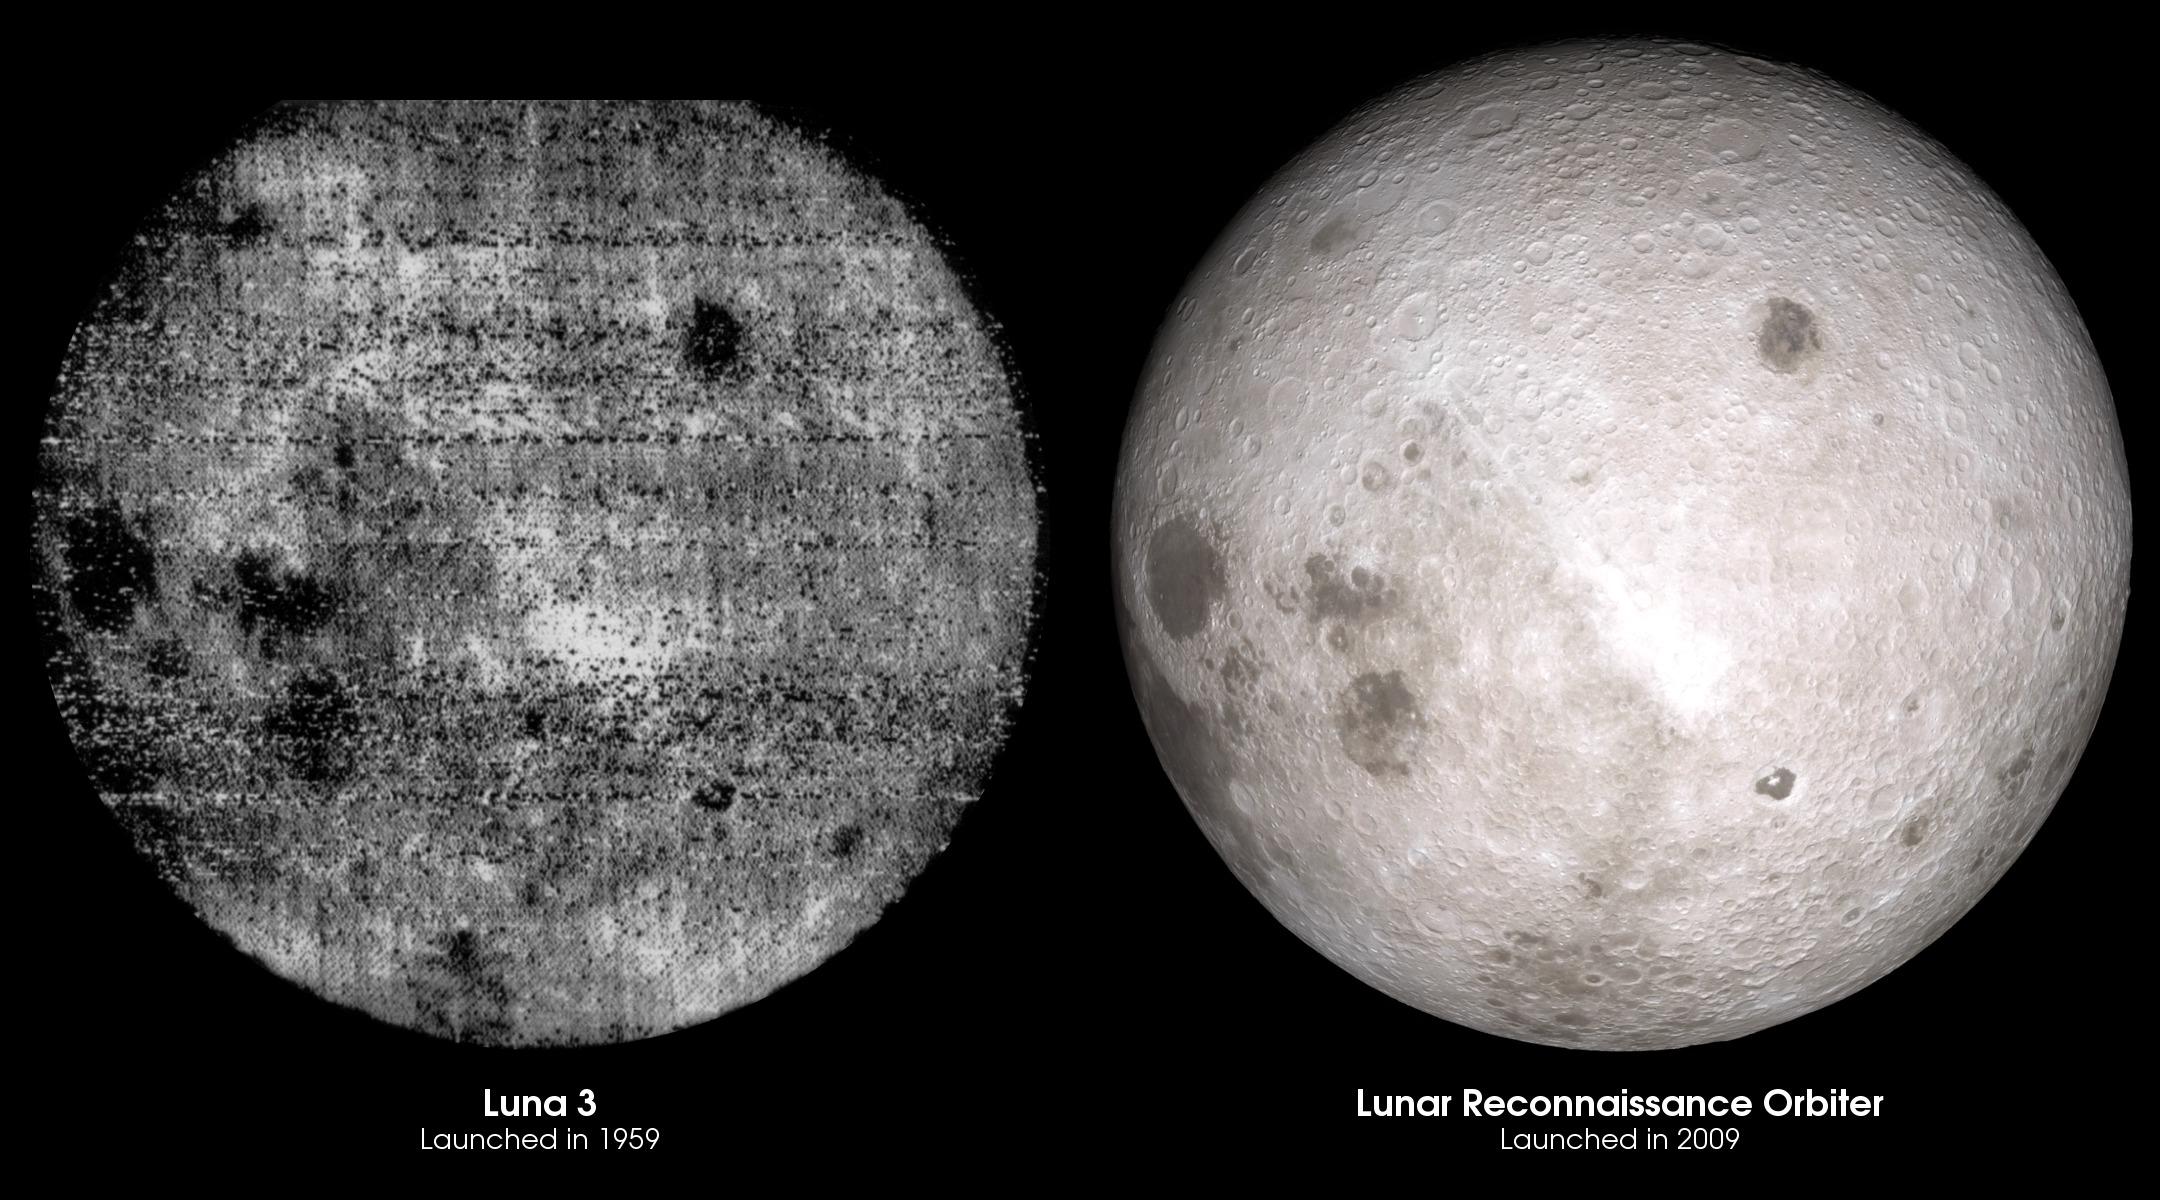 luna3_compare.jpg